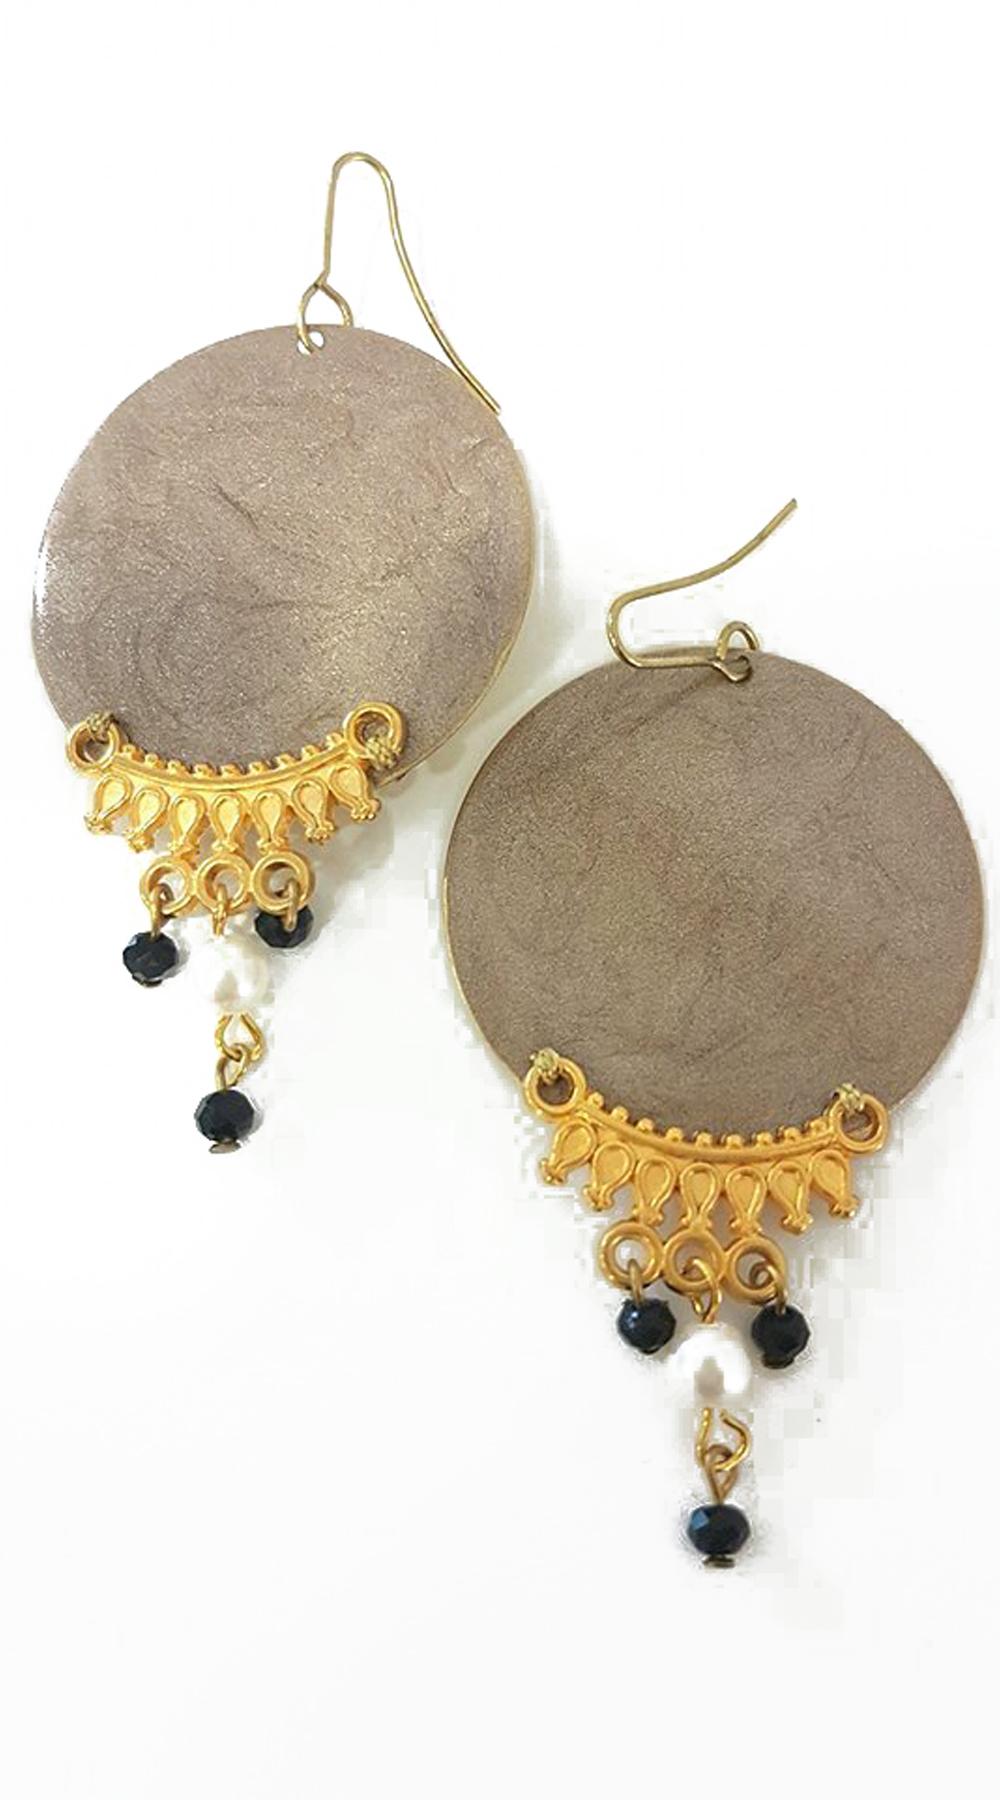 Handmade σκουλαρίκια gypsy style με πολύχρωμες πέτρες - MissReina - FA17AC-6c678 κοσμήματα σκουλαρίκια